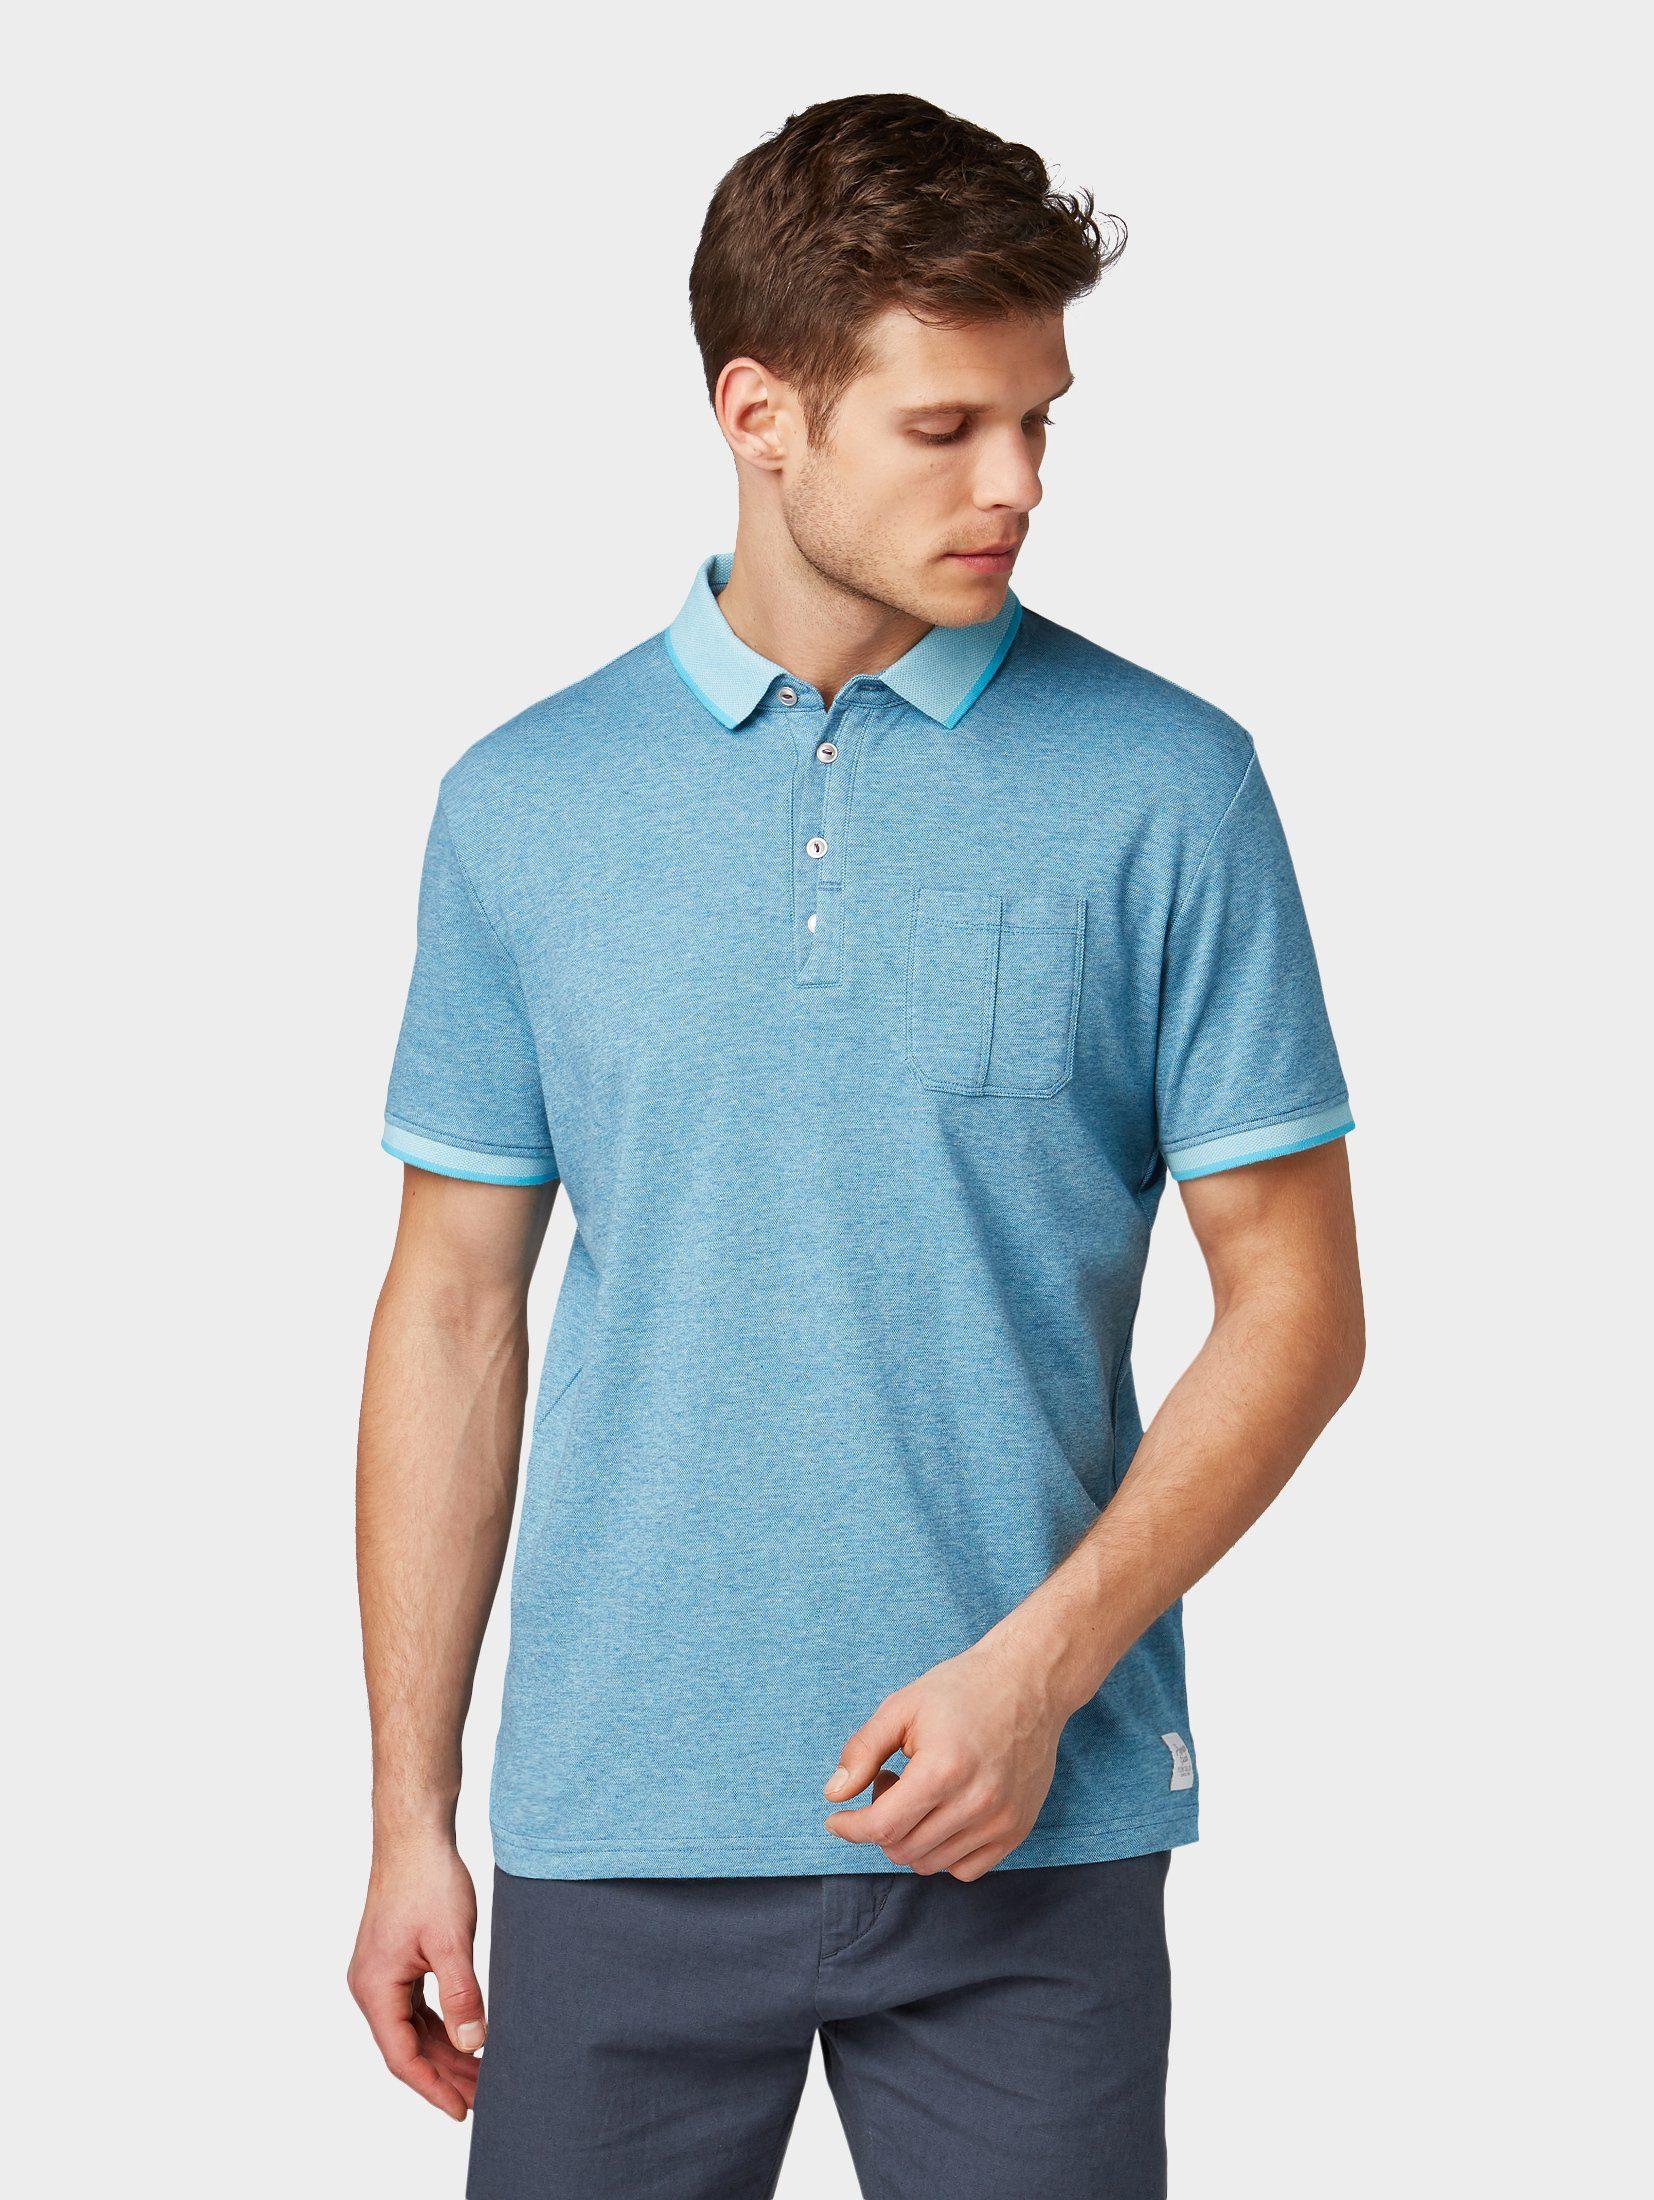 TOM TAILOR T Shirt »Mehrfarbiges Poloshirt« kaufen | OTTO